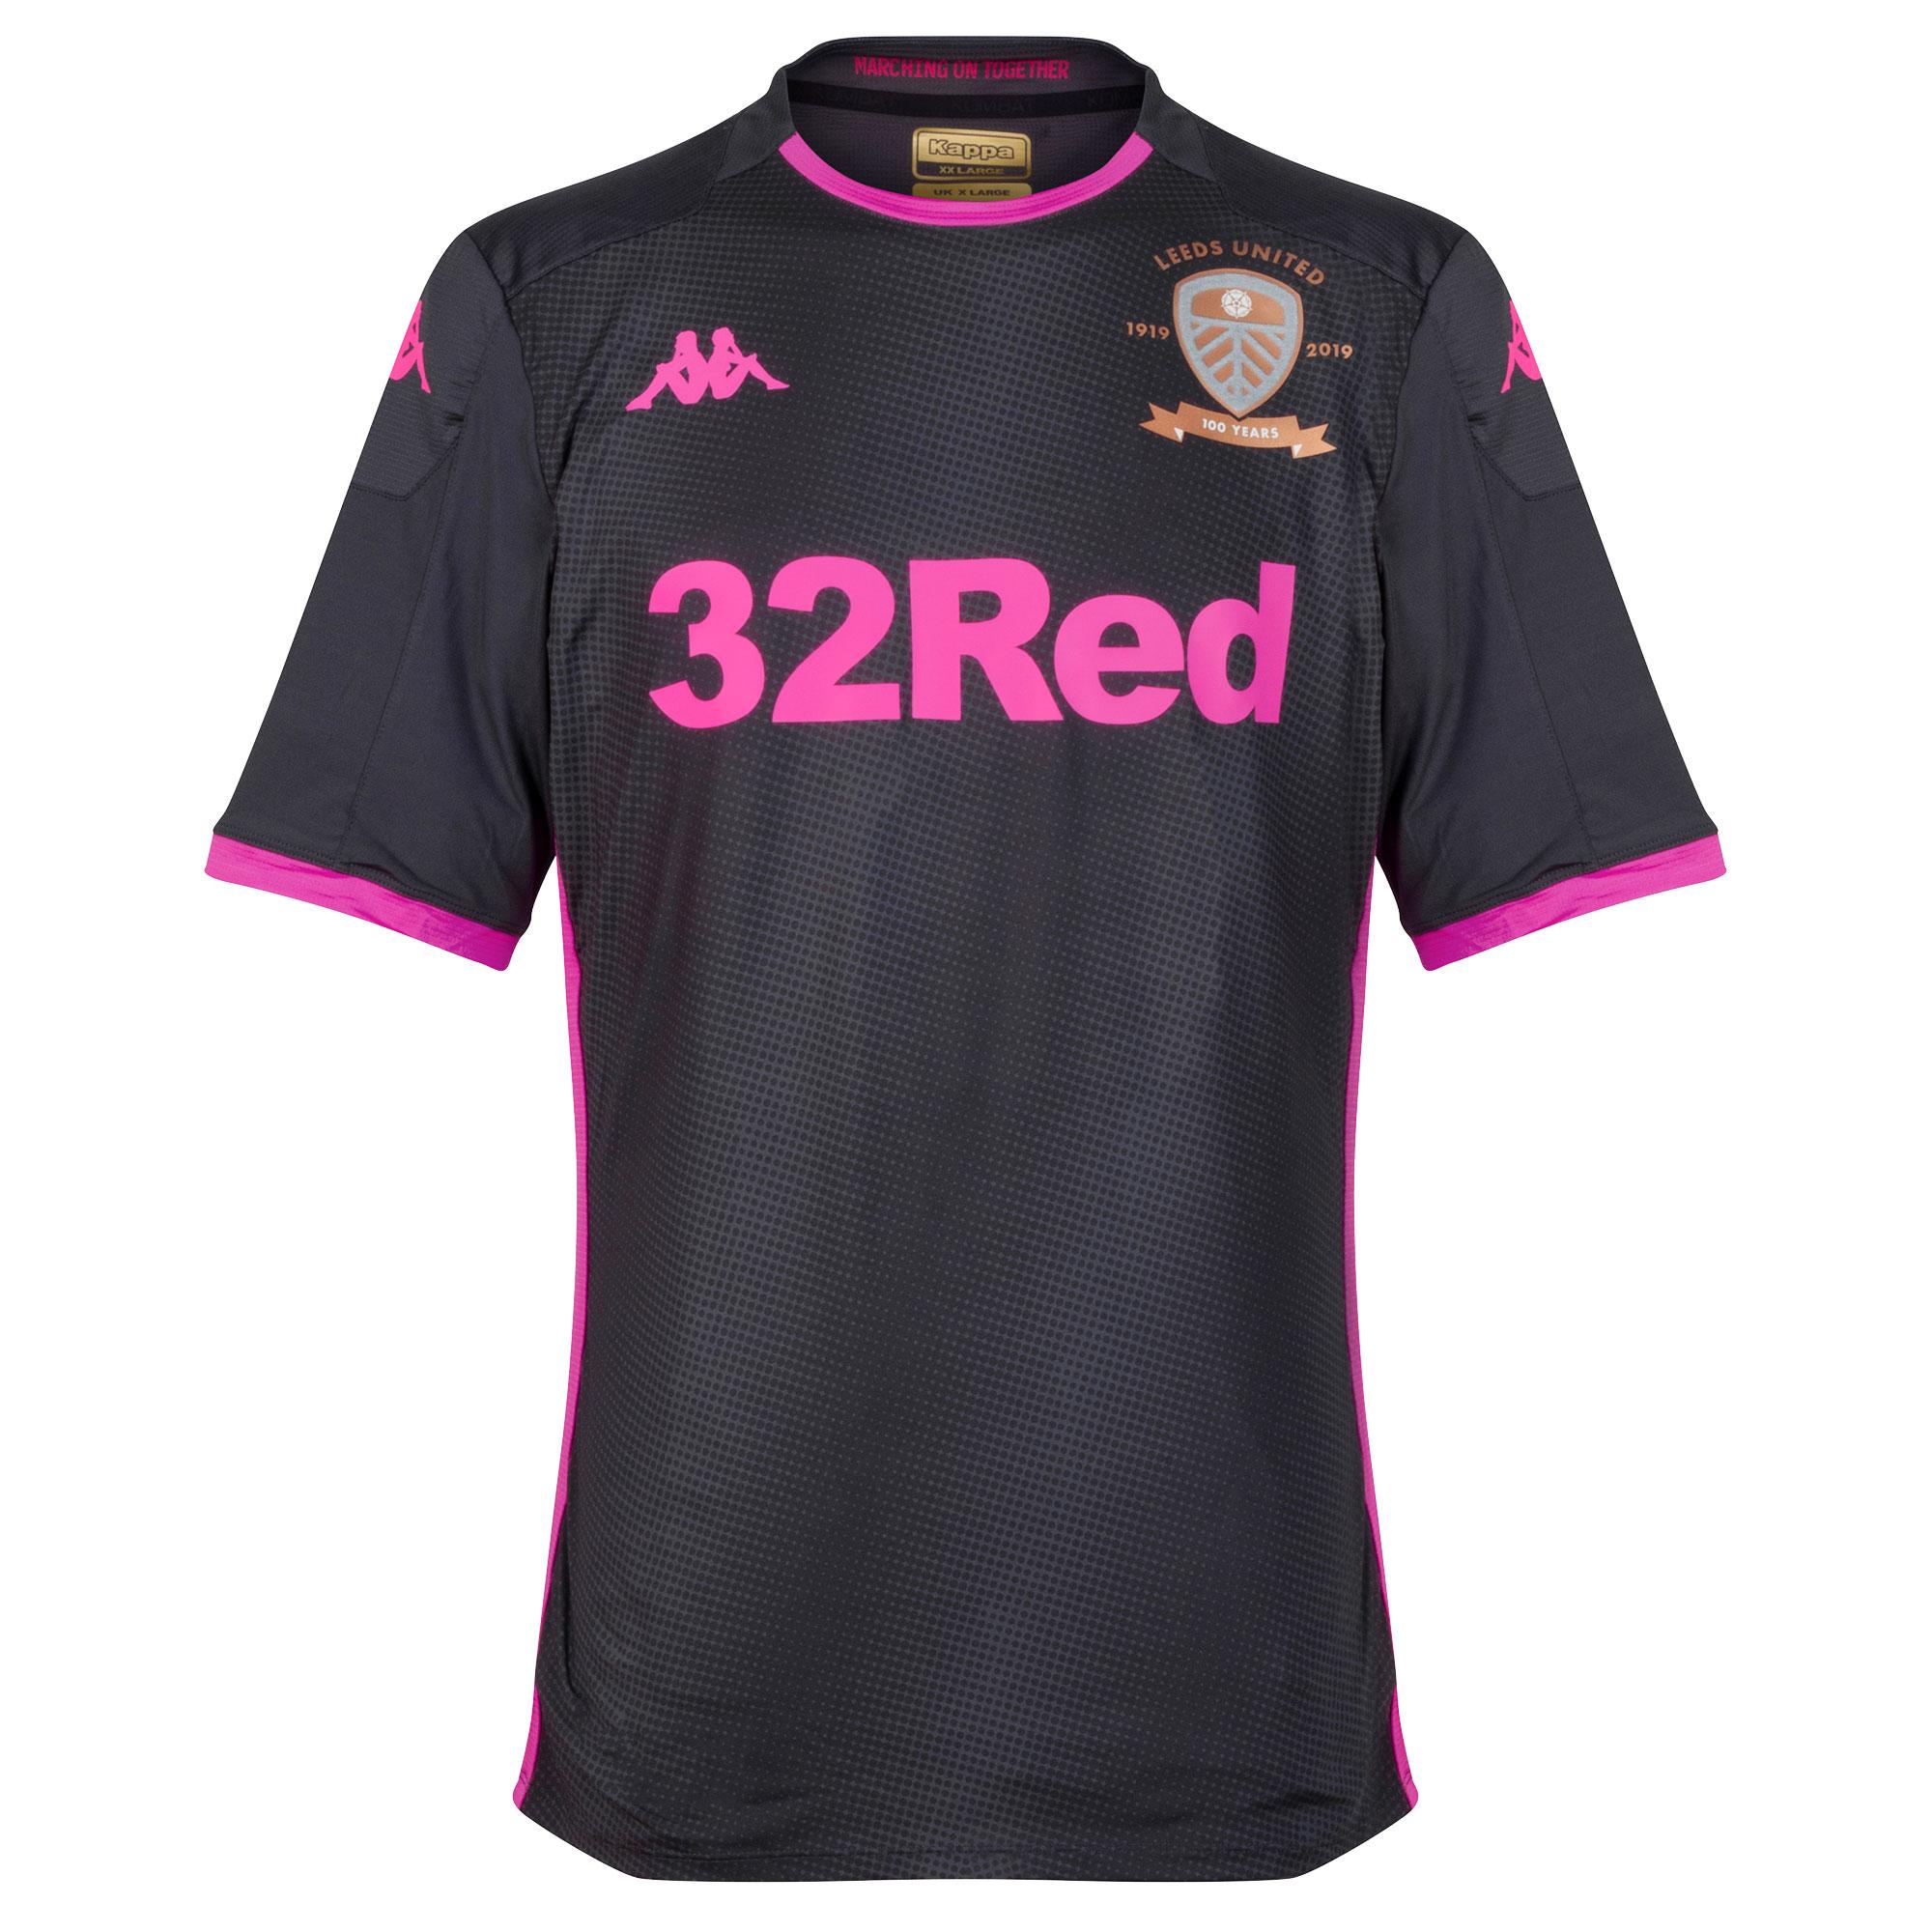 Kappa Leeds Utd Away Pro Shirt 2019-2020 (Slim Fit)